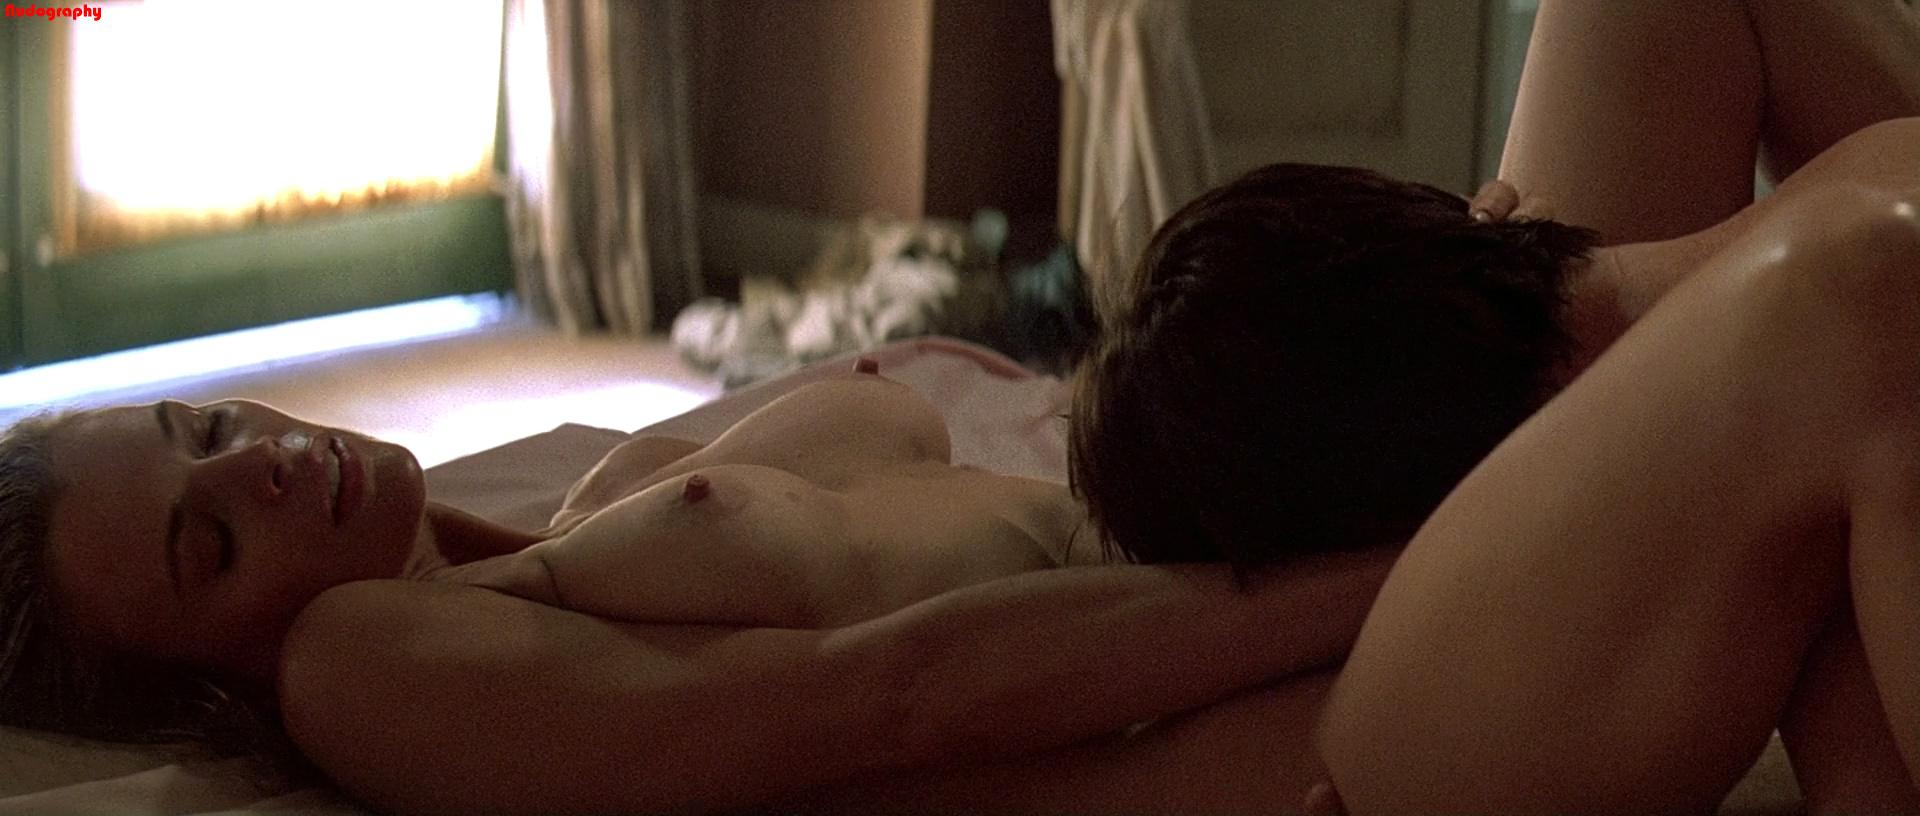 Naked kim basinger in the getaway